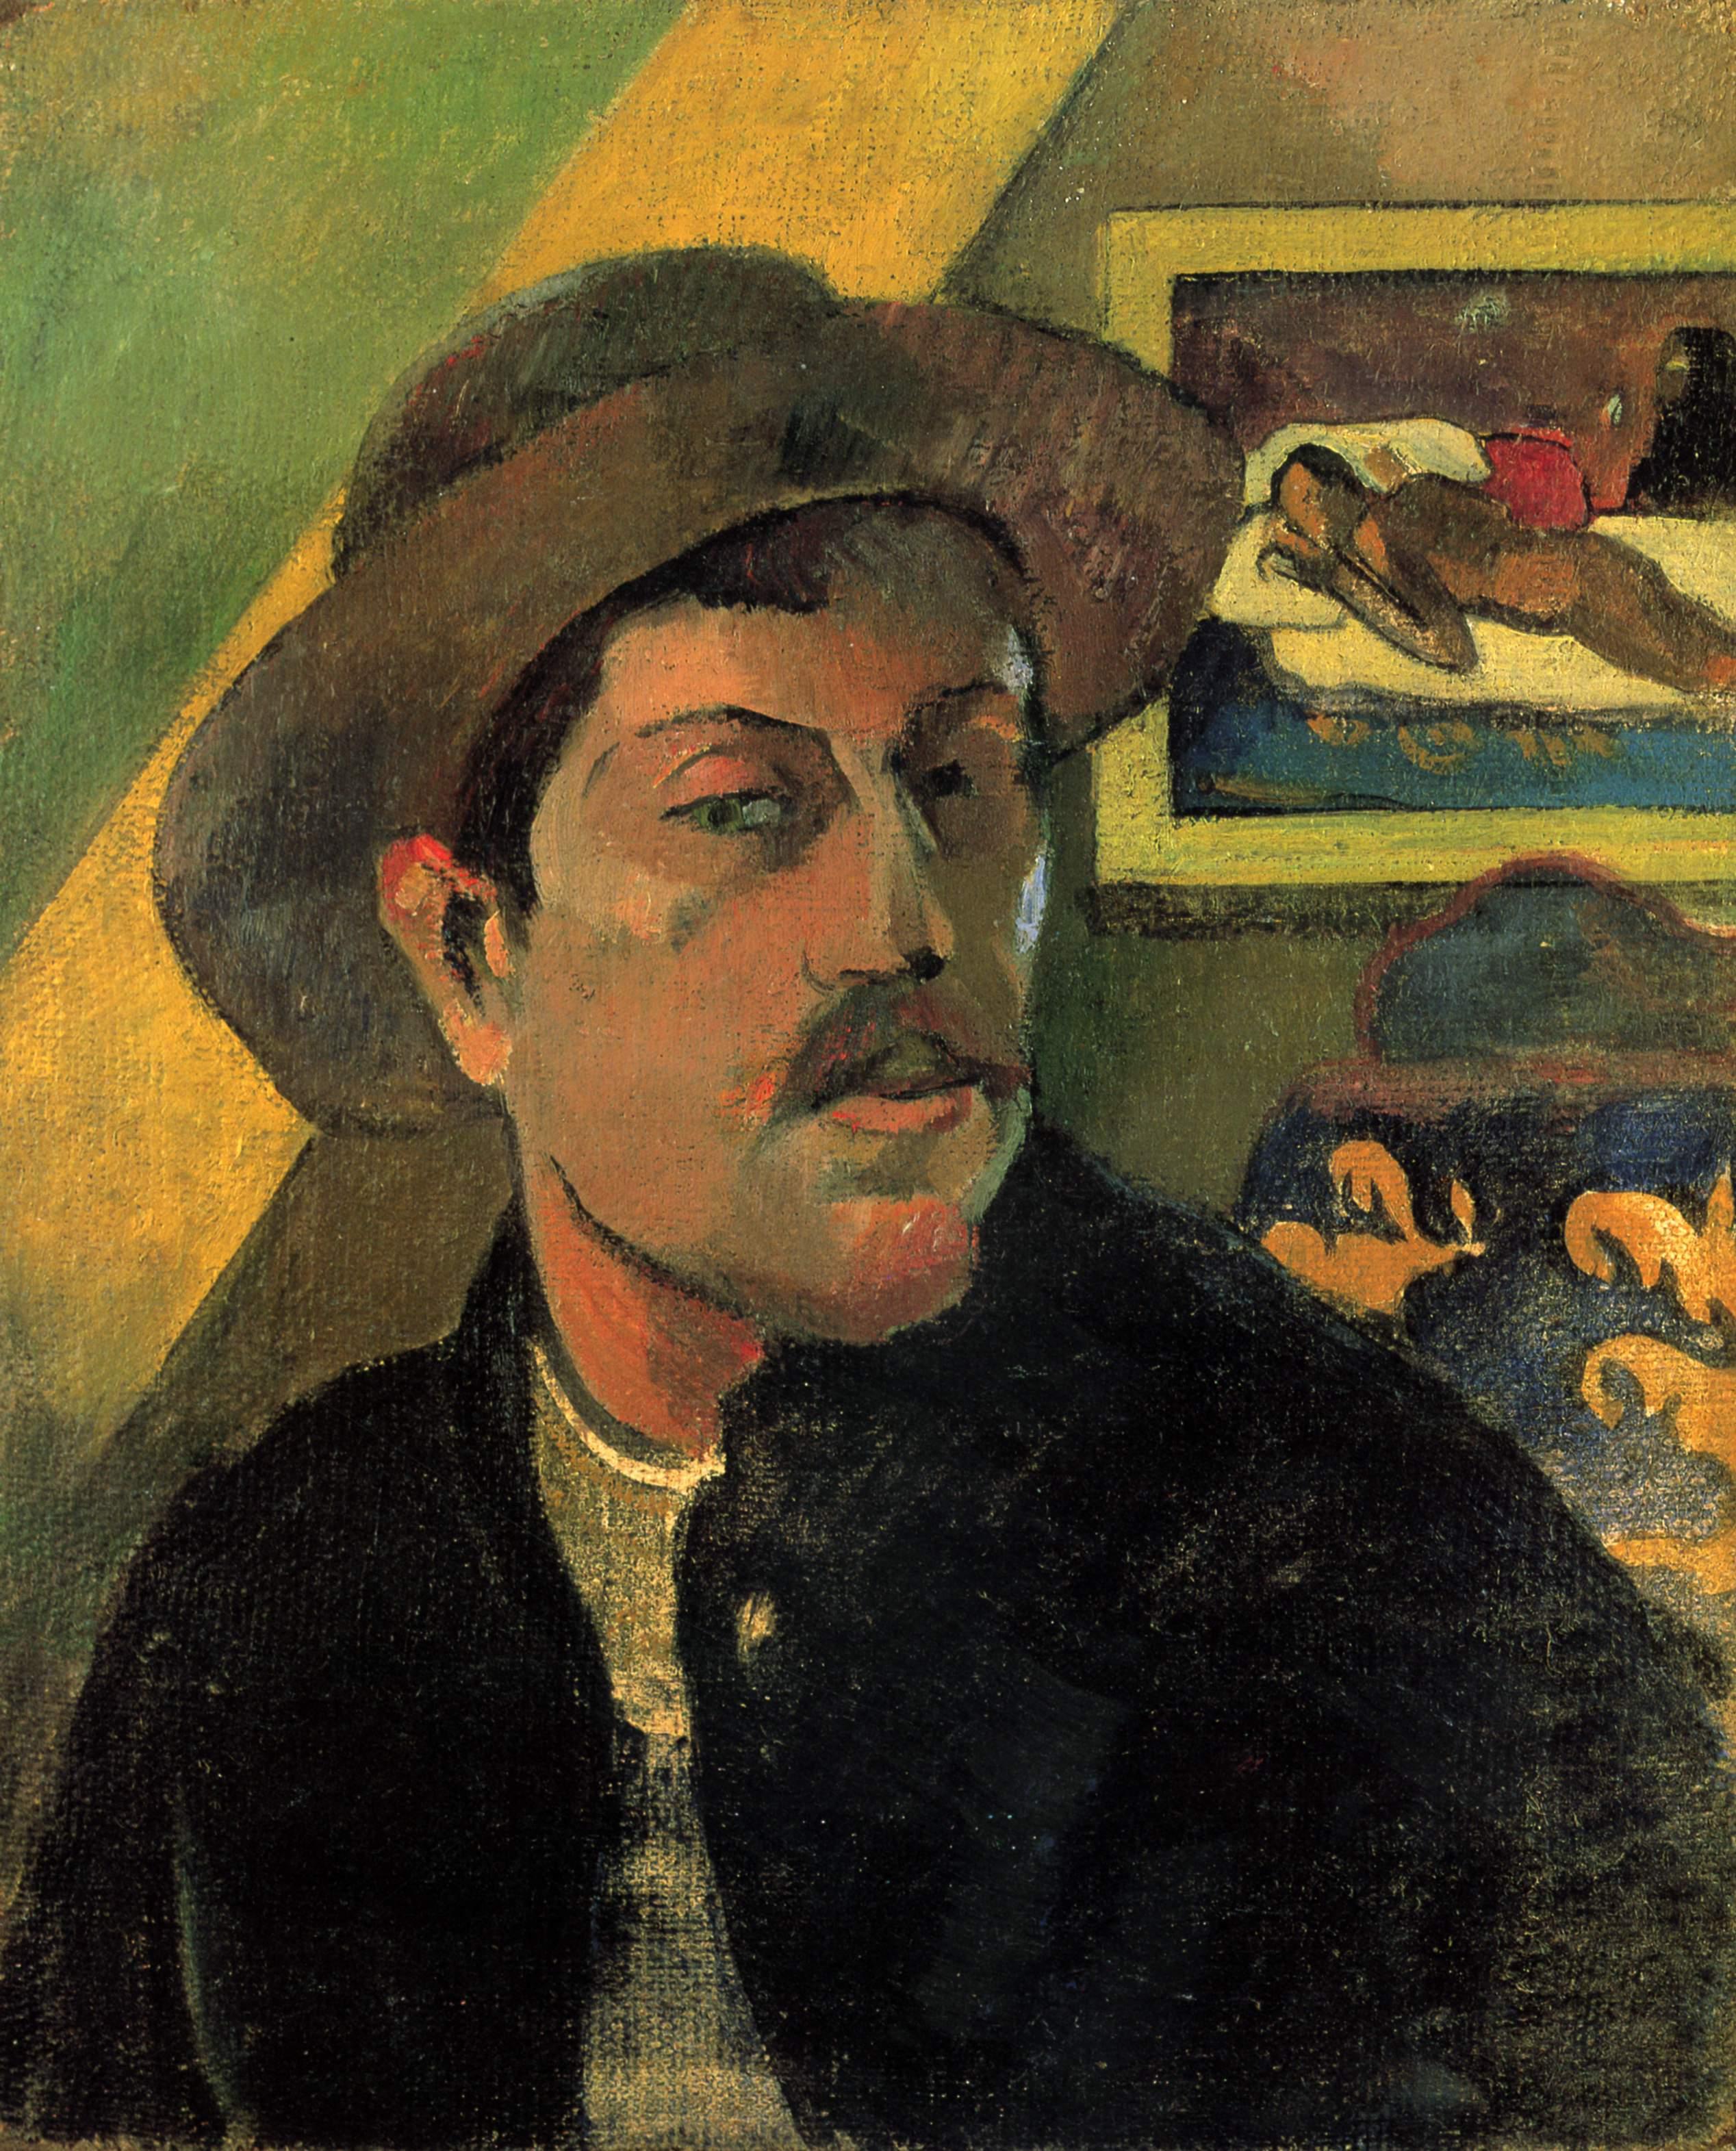 Depiction of Paul Gauguin